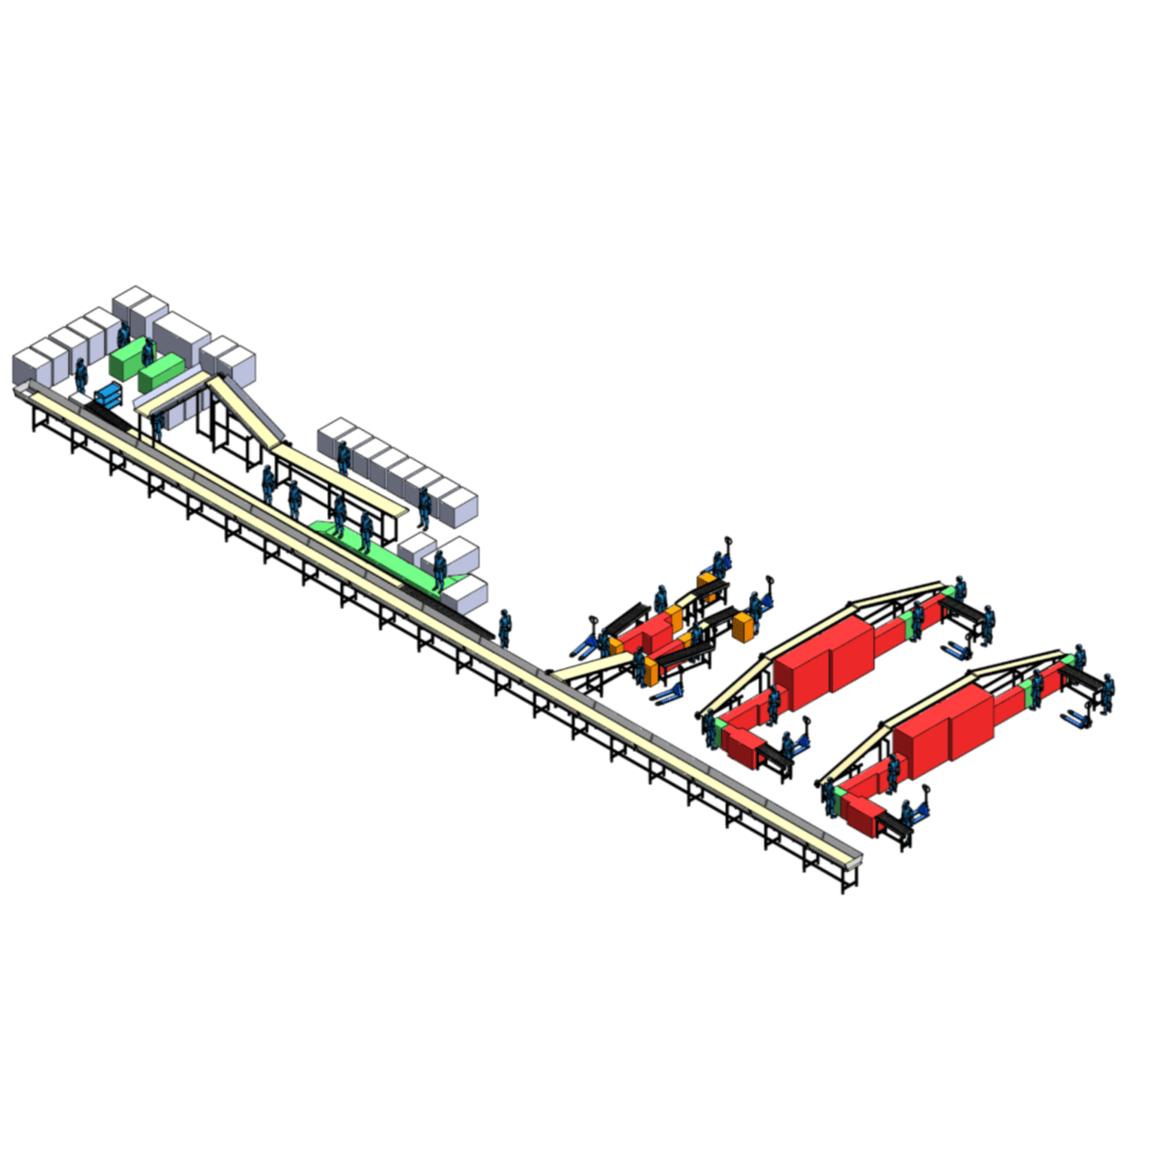 NESKO Engineering - Transportsystemen 1-1